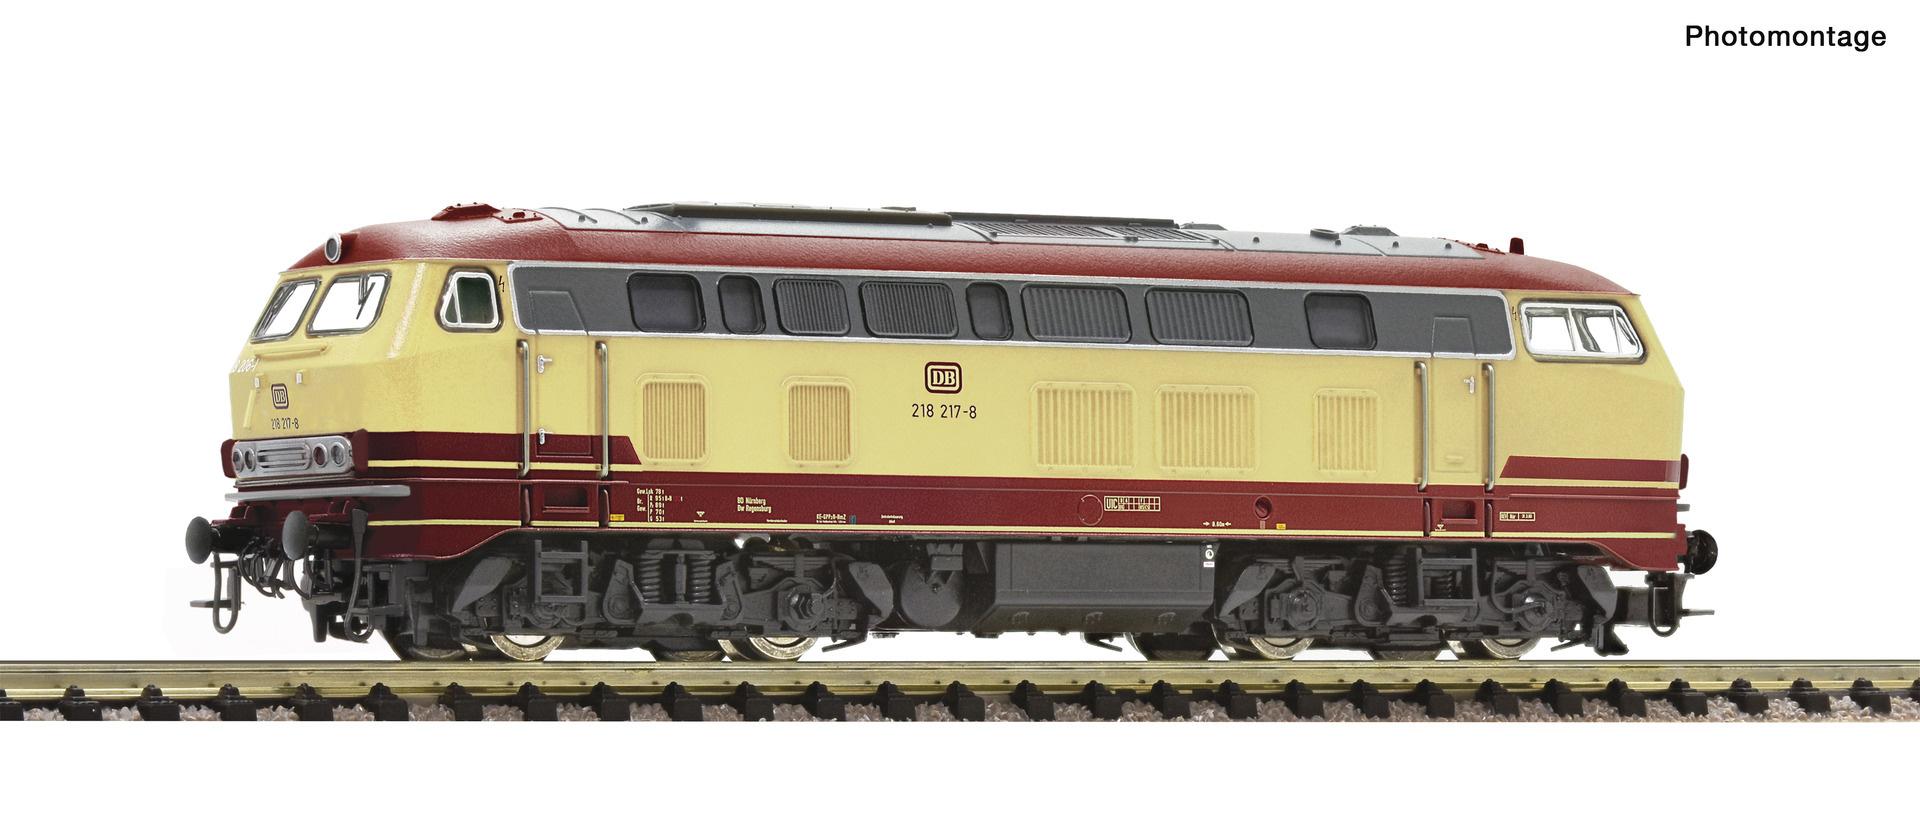 724289 Diesellok 218 217 DB Snd.-1